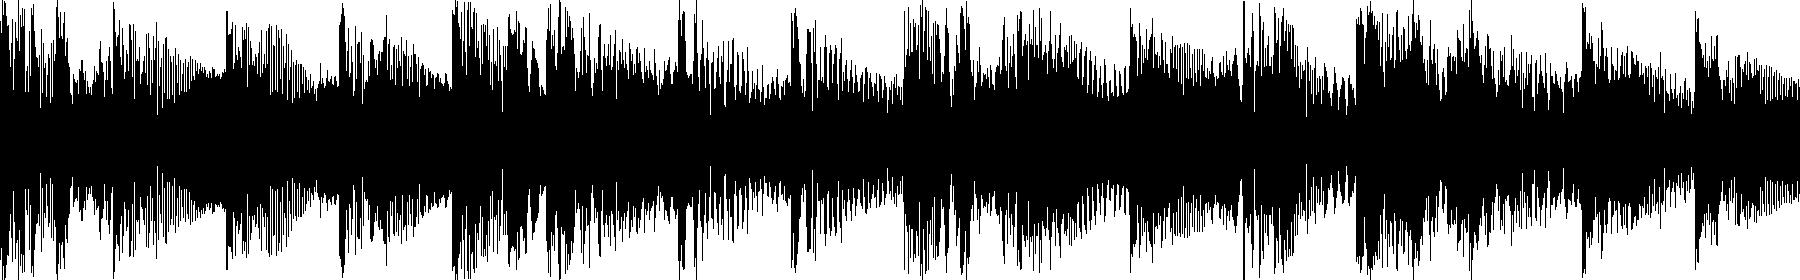 shg music loop 01 p1